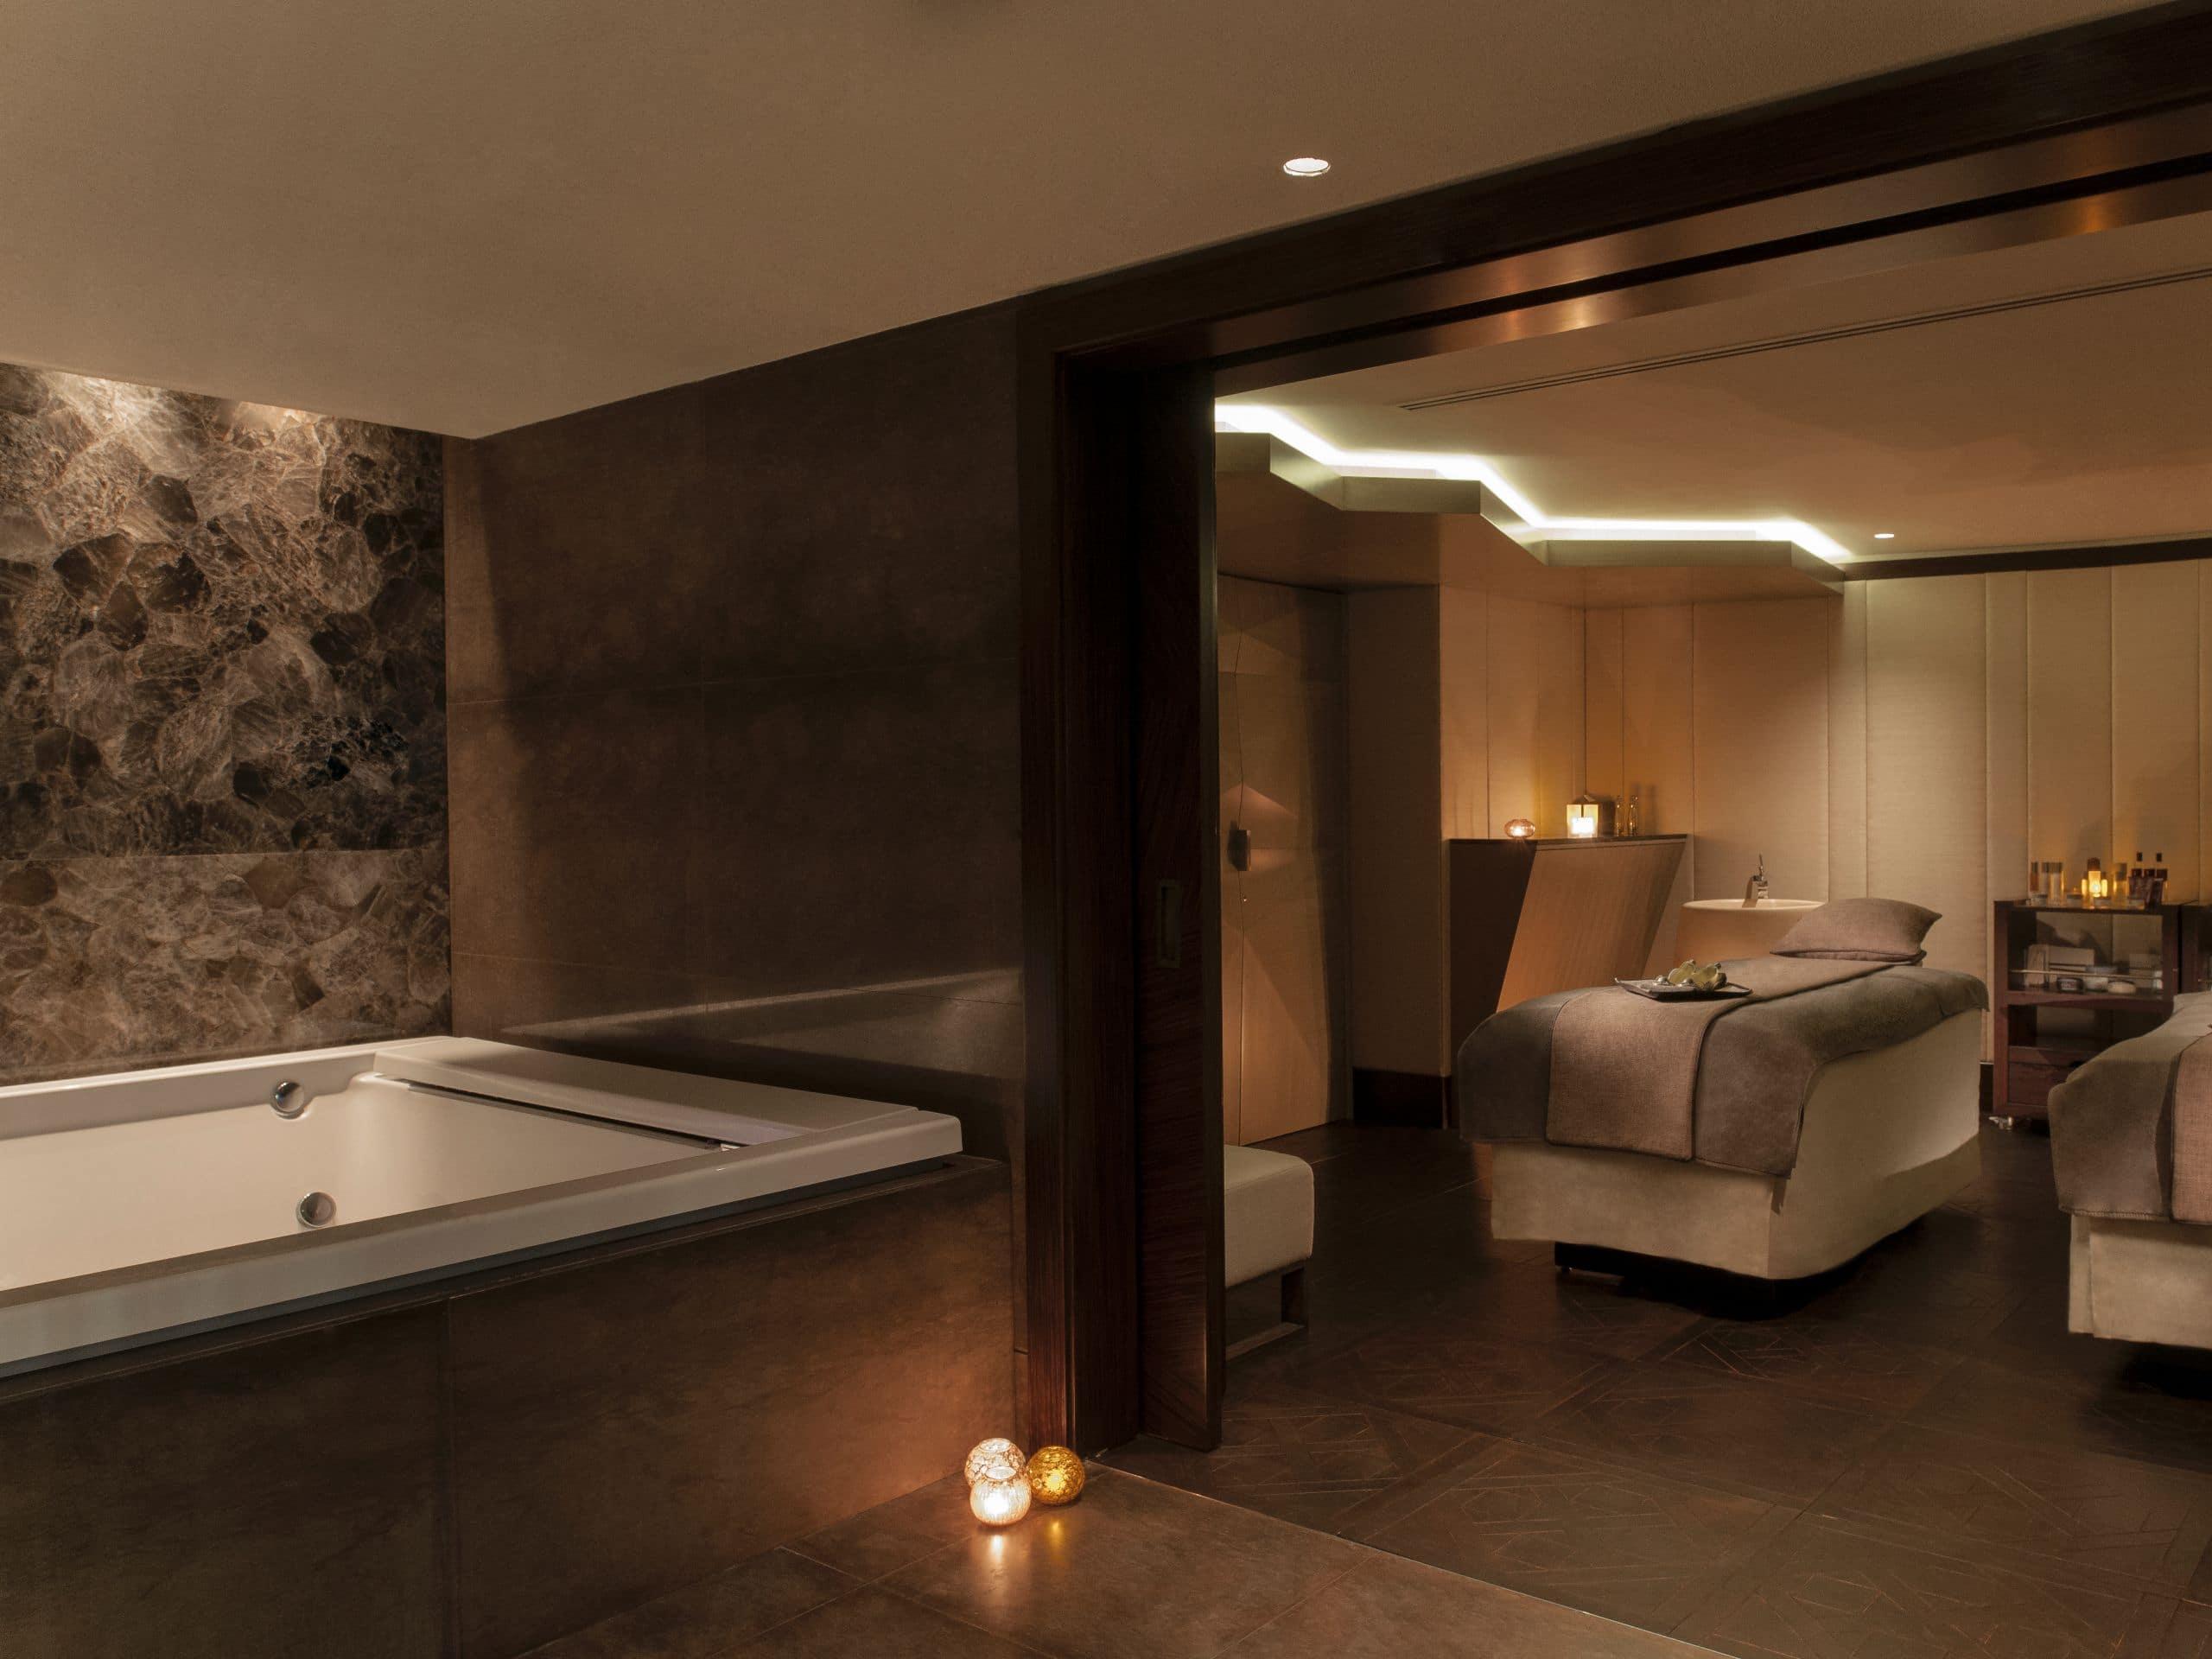 Istanbul hotel near the bosphorus hyatt centric levent istanbul